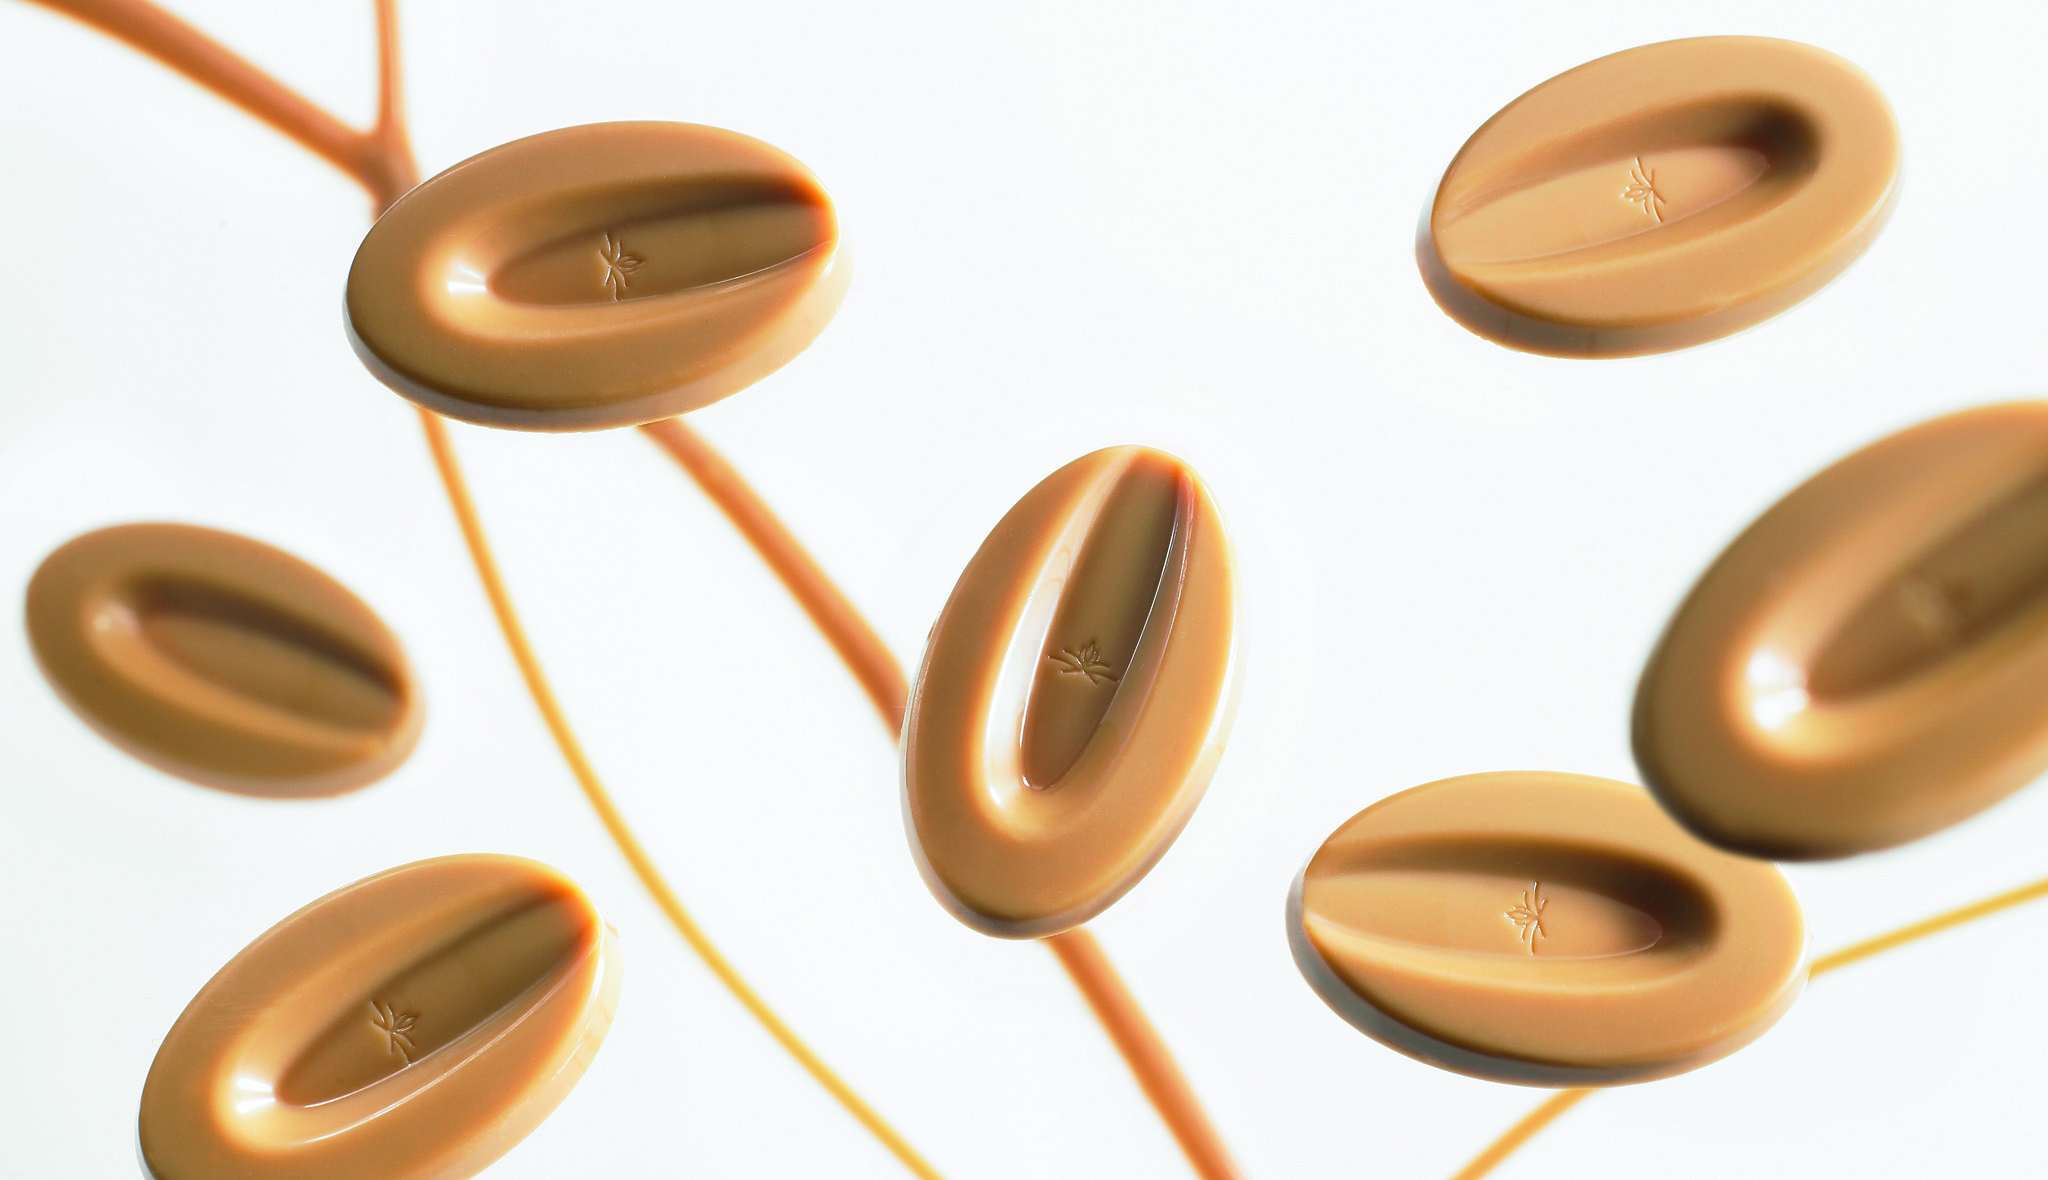 sari-cikolata